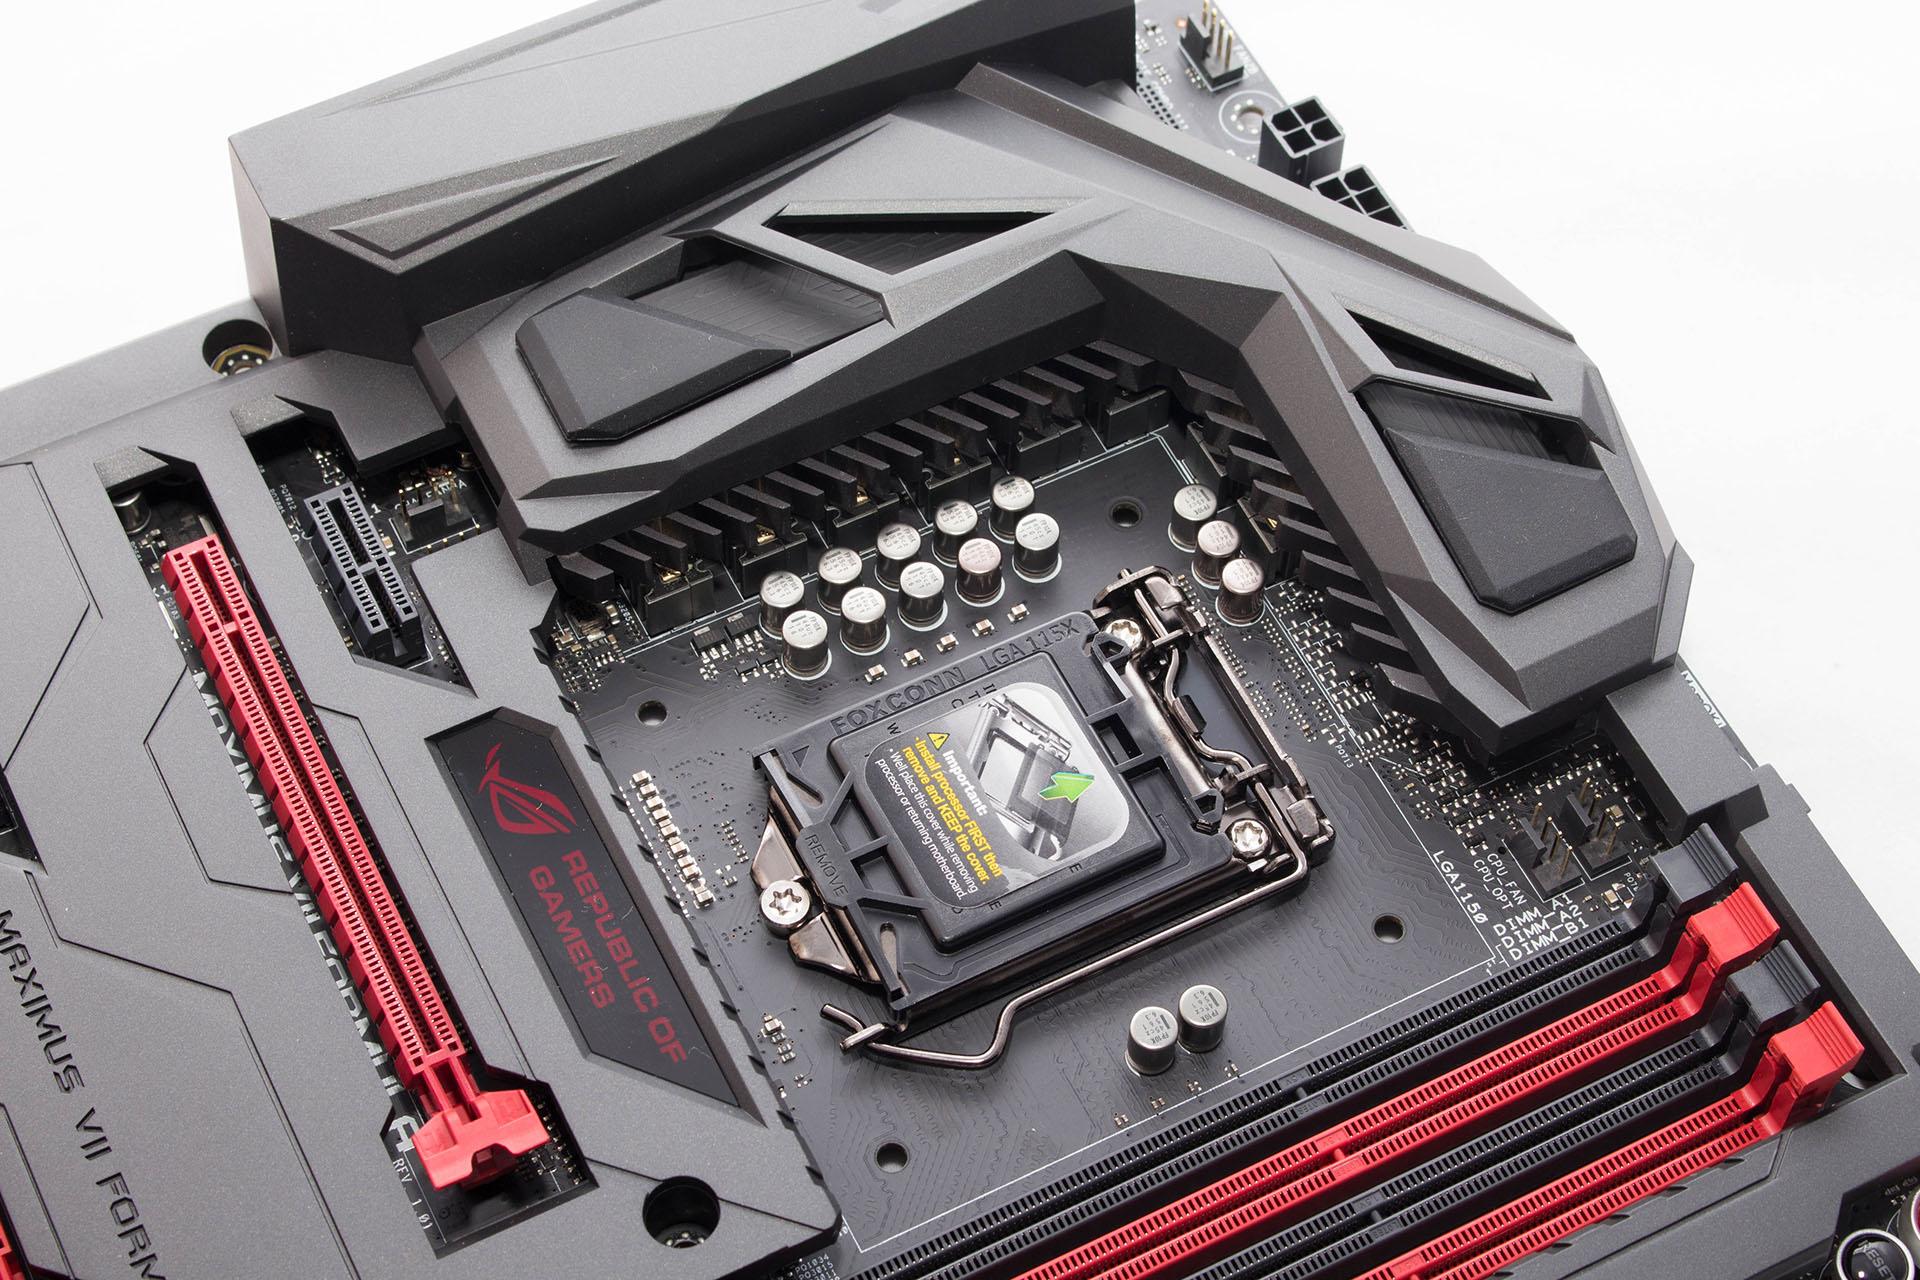 Asus Maximus VII Formula WD & Gigabyte Z97X-Gaming GT test